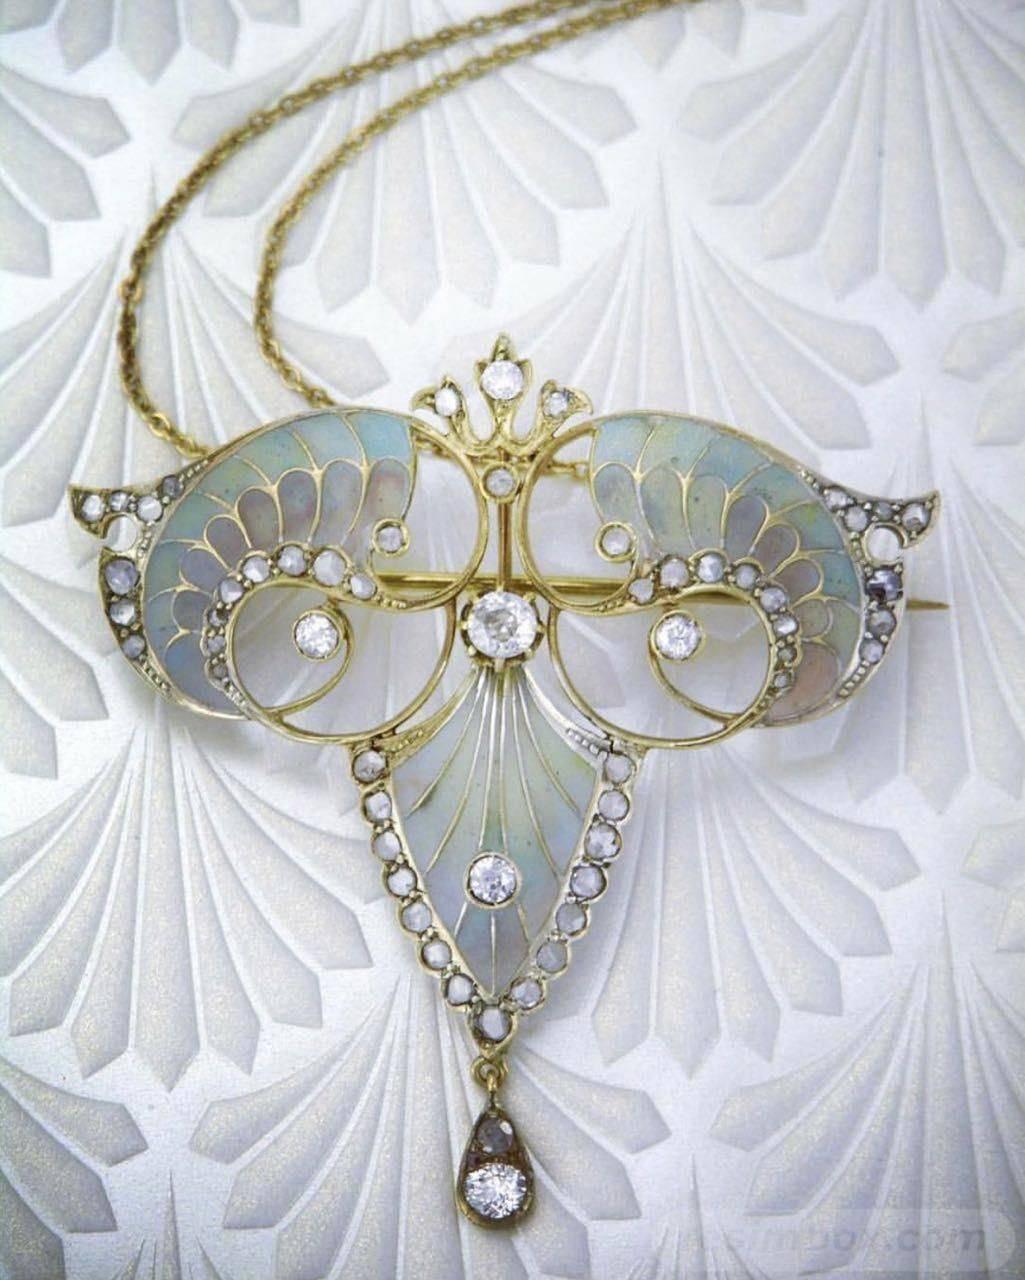 Art deco jewelry-544372673708580880